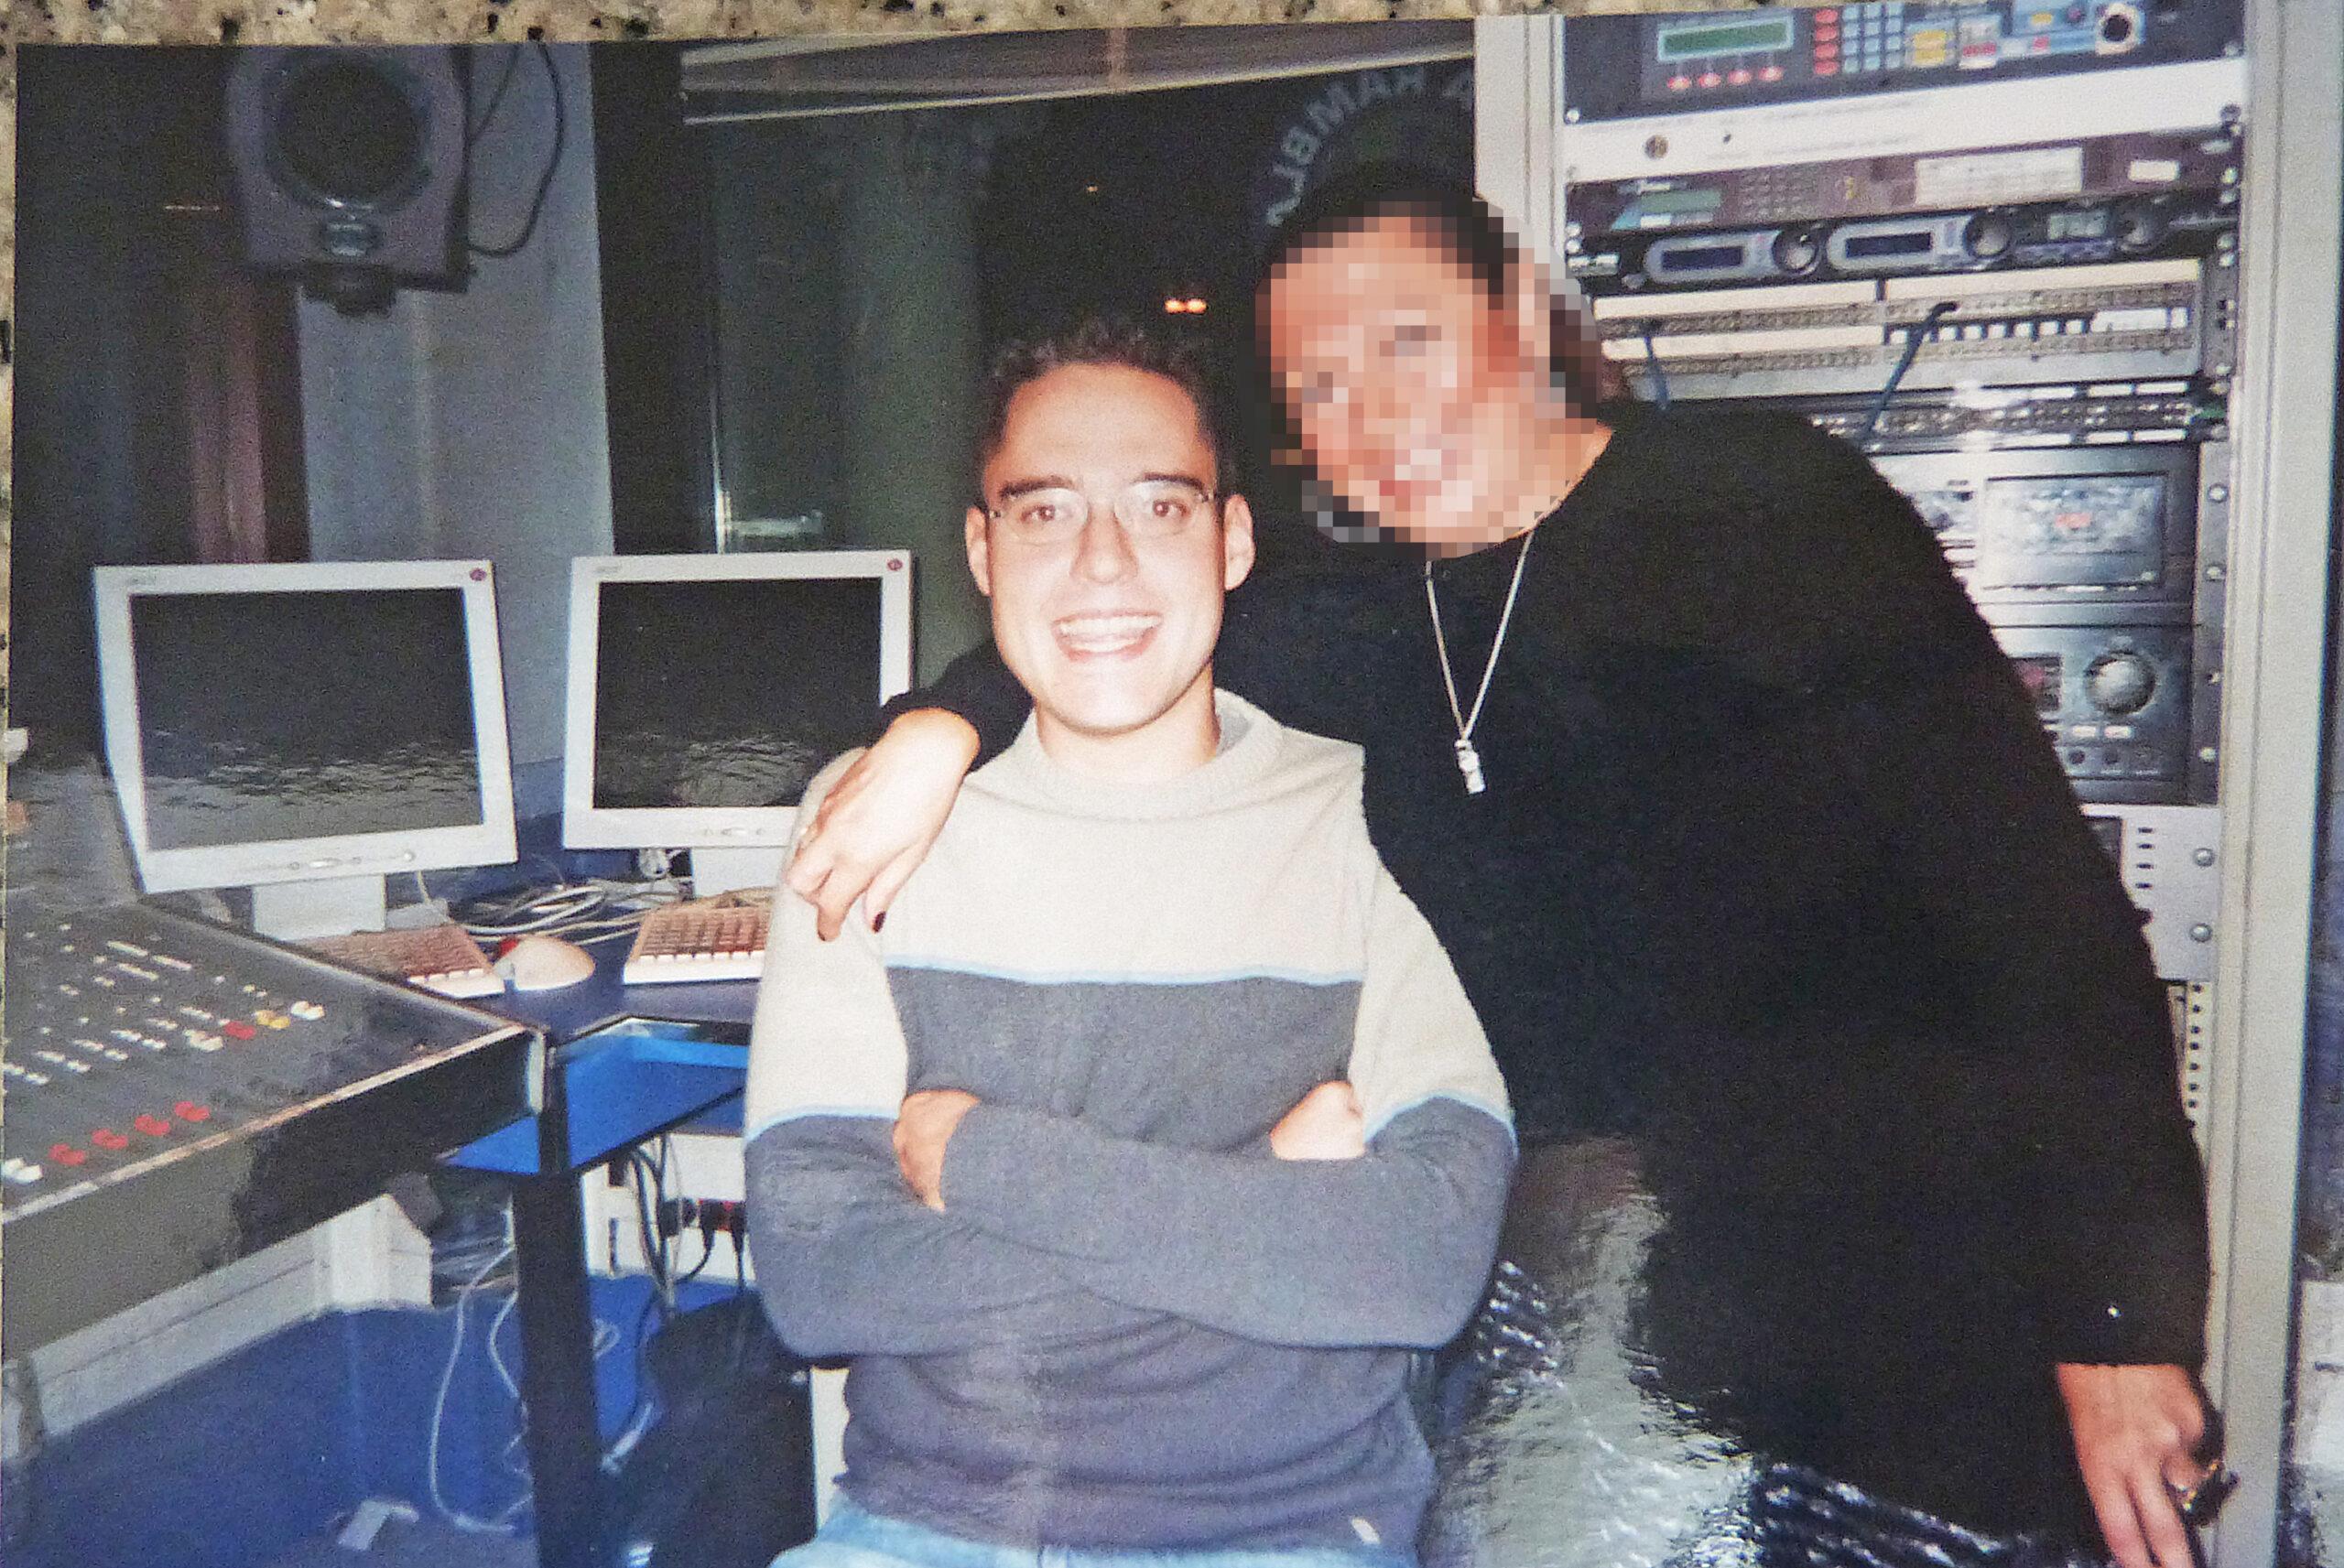 ivan jimenez con una compañera de la radio Onda Cero Cataluña